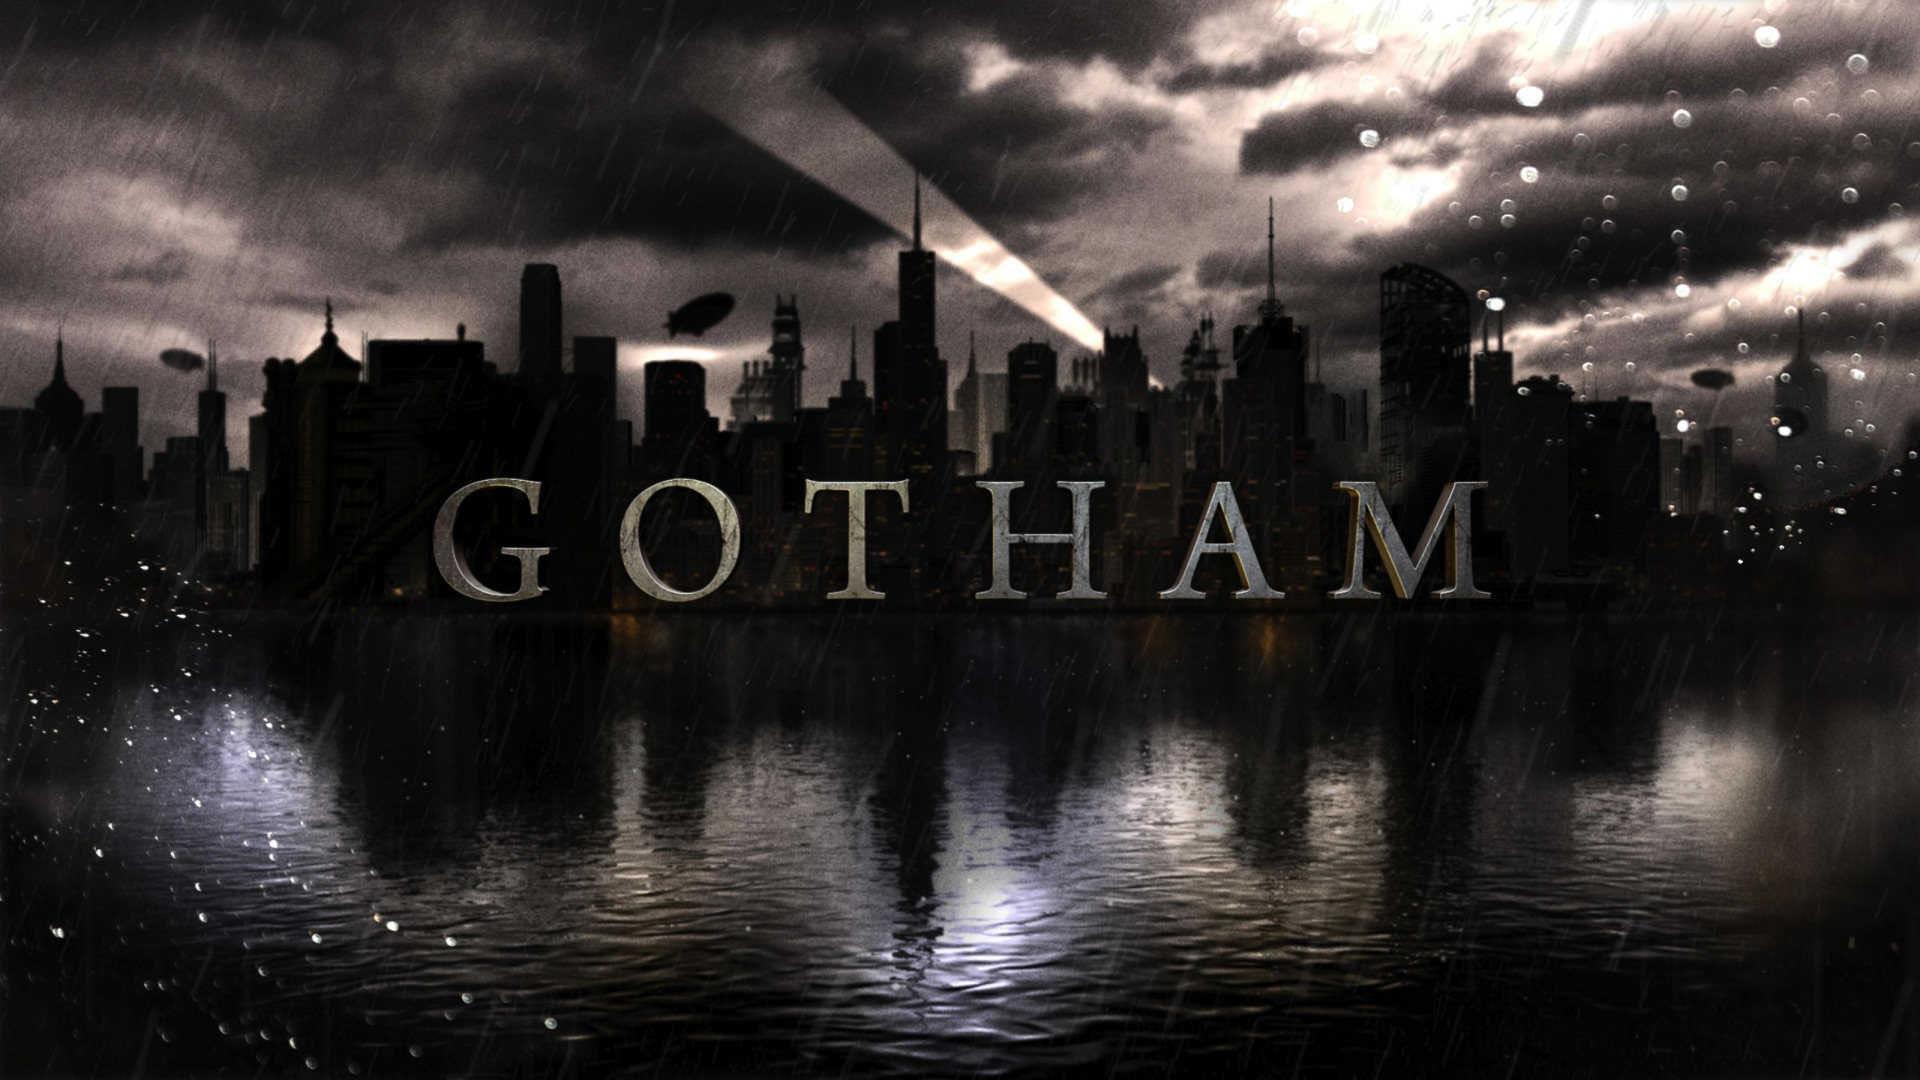 Gotham City by Night wallpaper